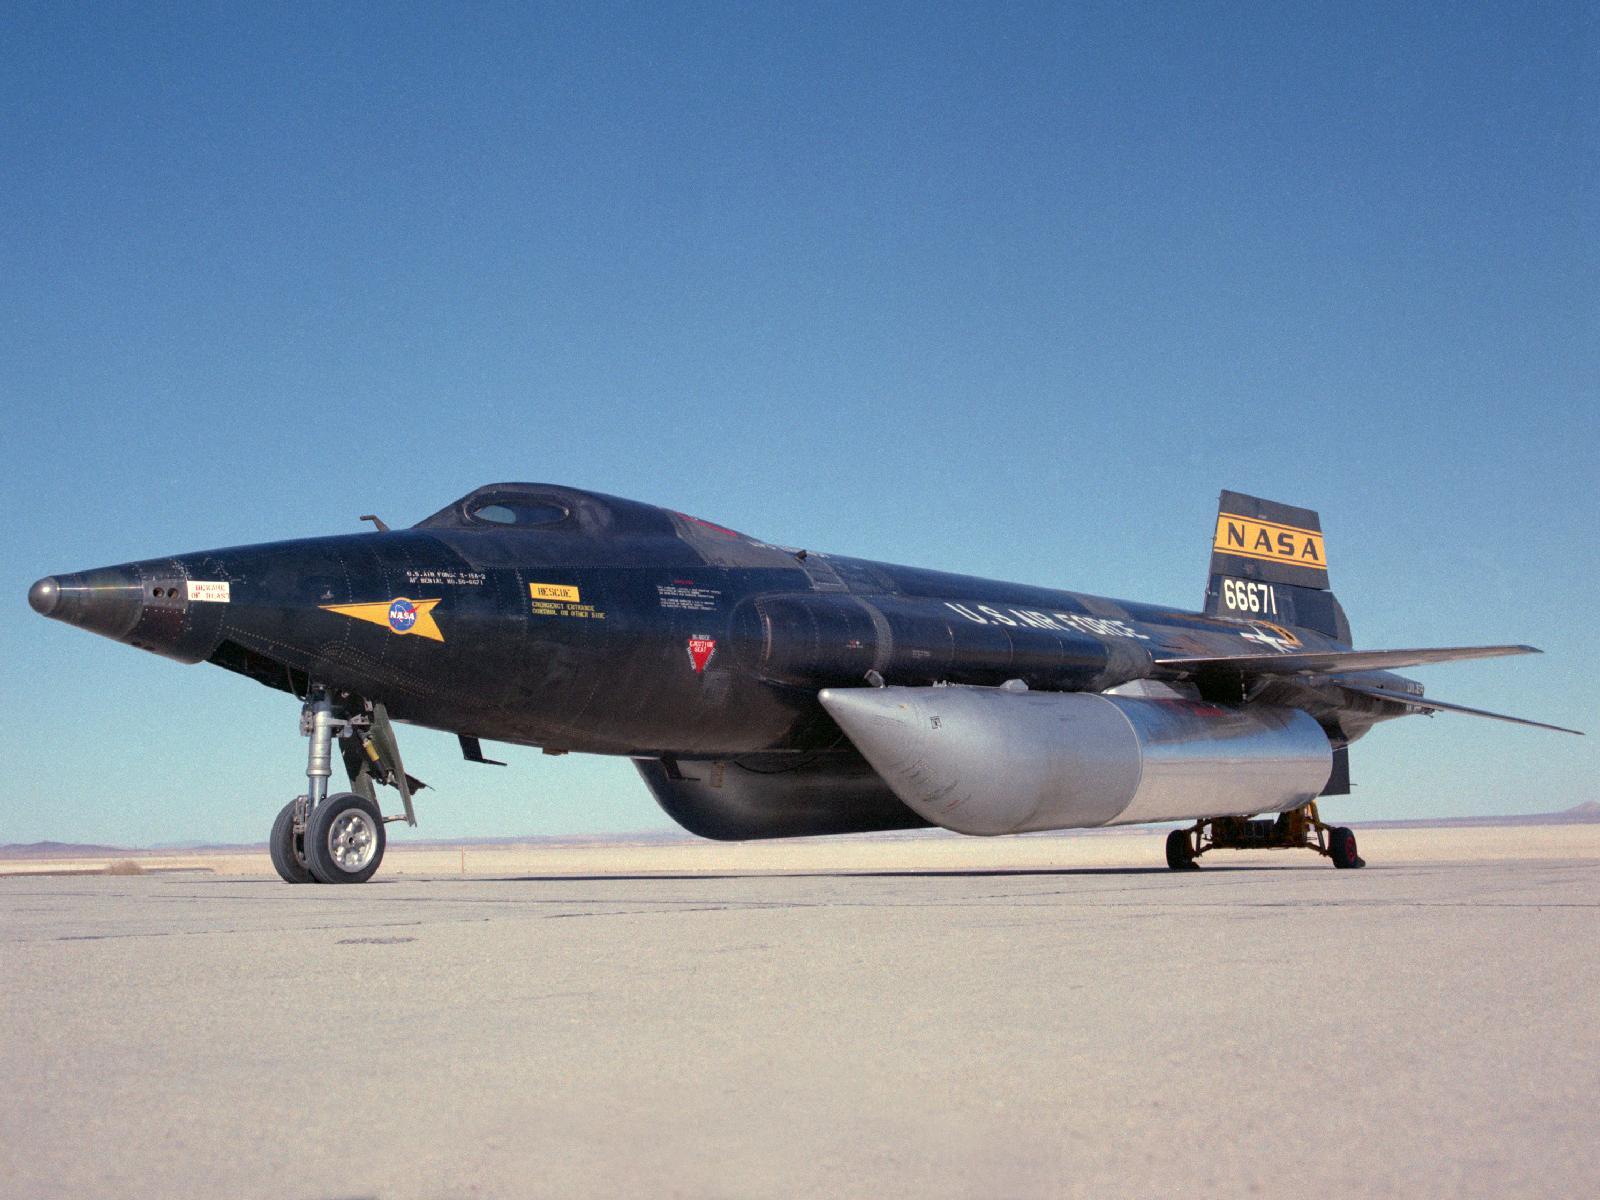 Second X-15 Rocket Plane